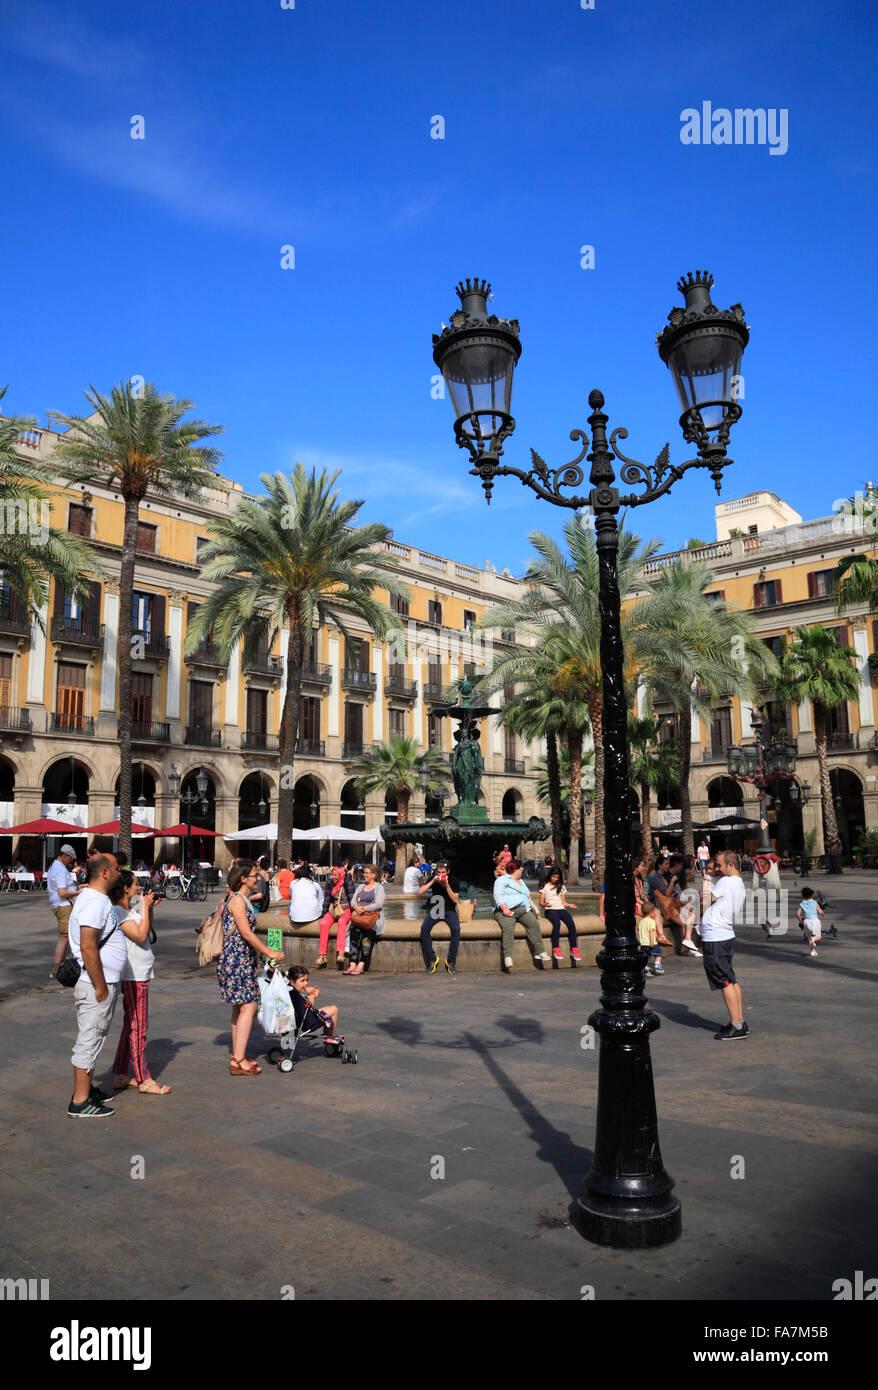 Placa Reial, Barri Gotic, Barcelona, Spain, Europe - Stock Image